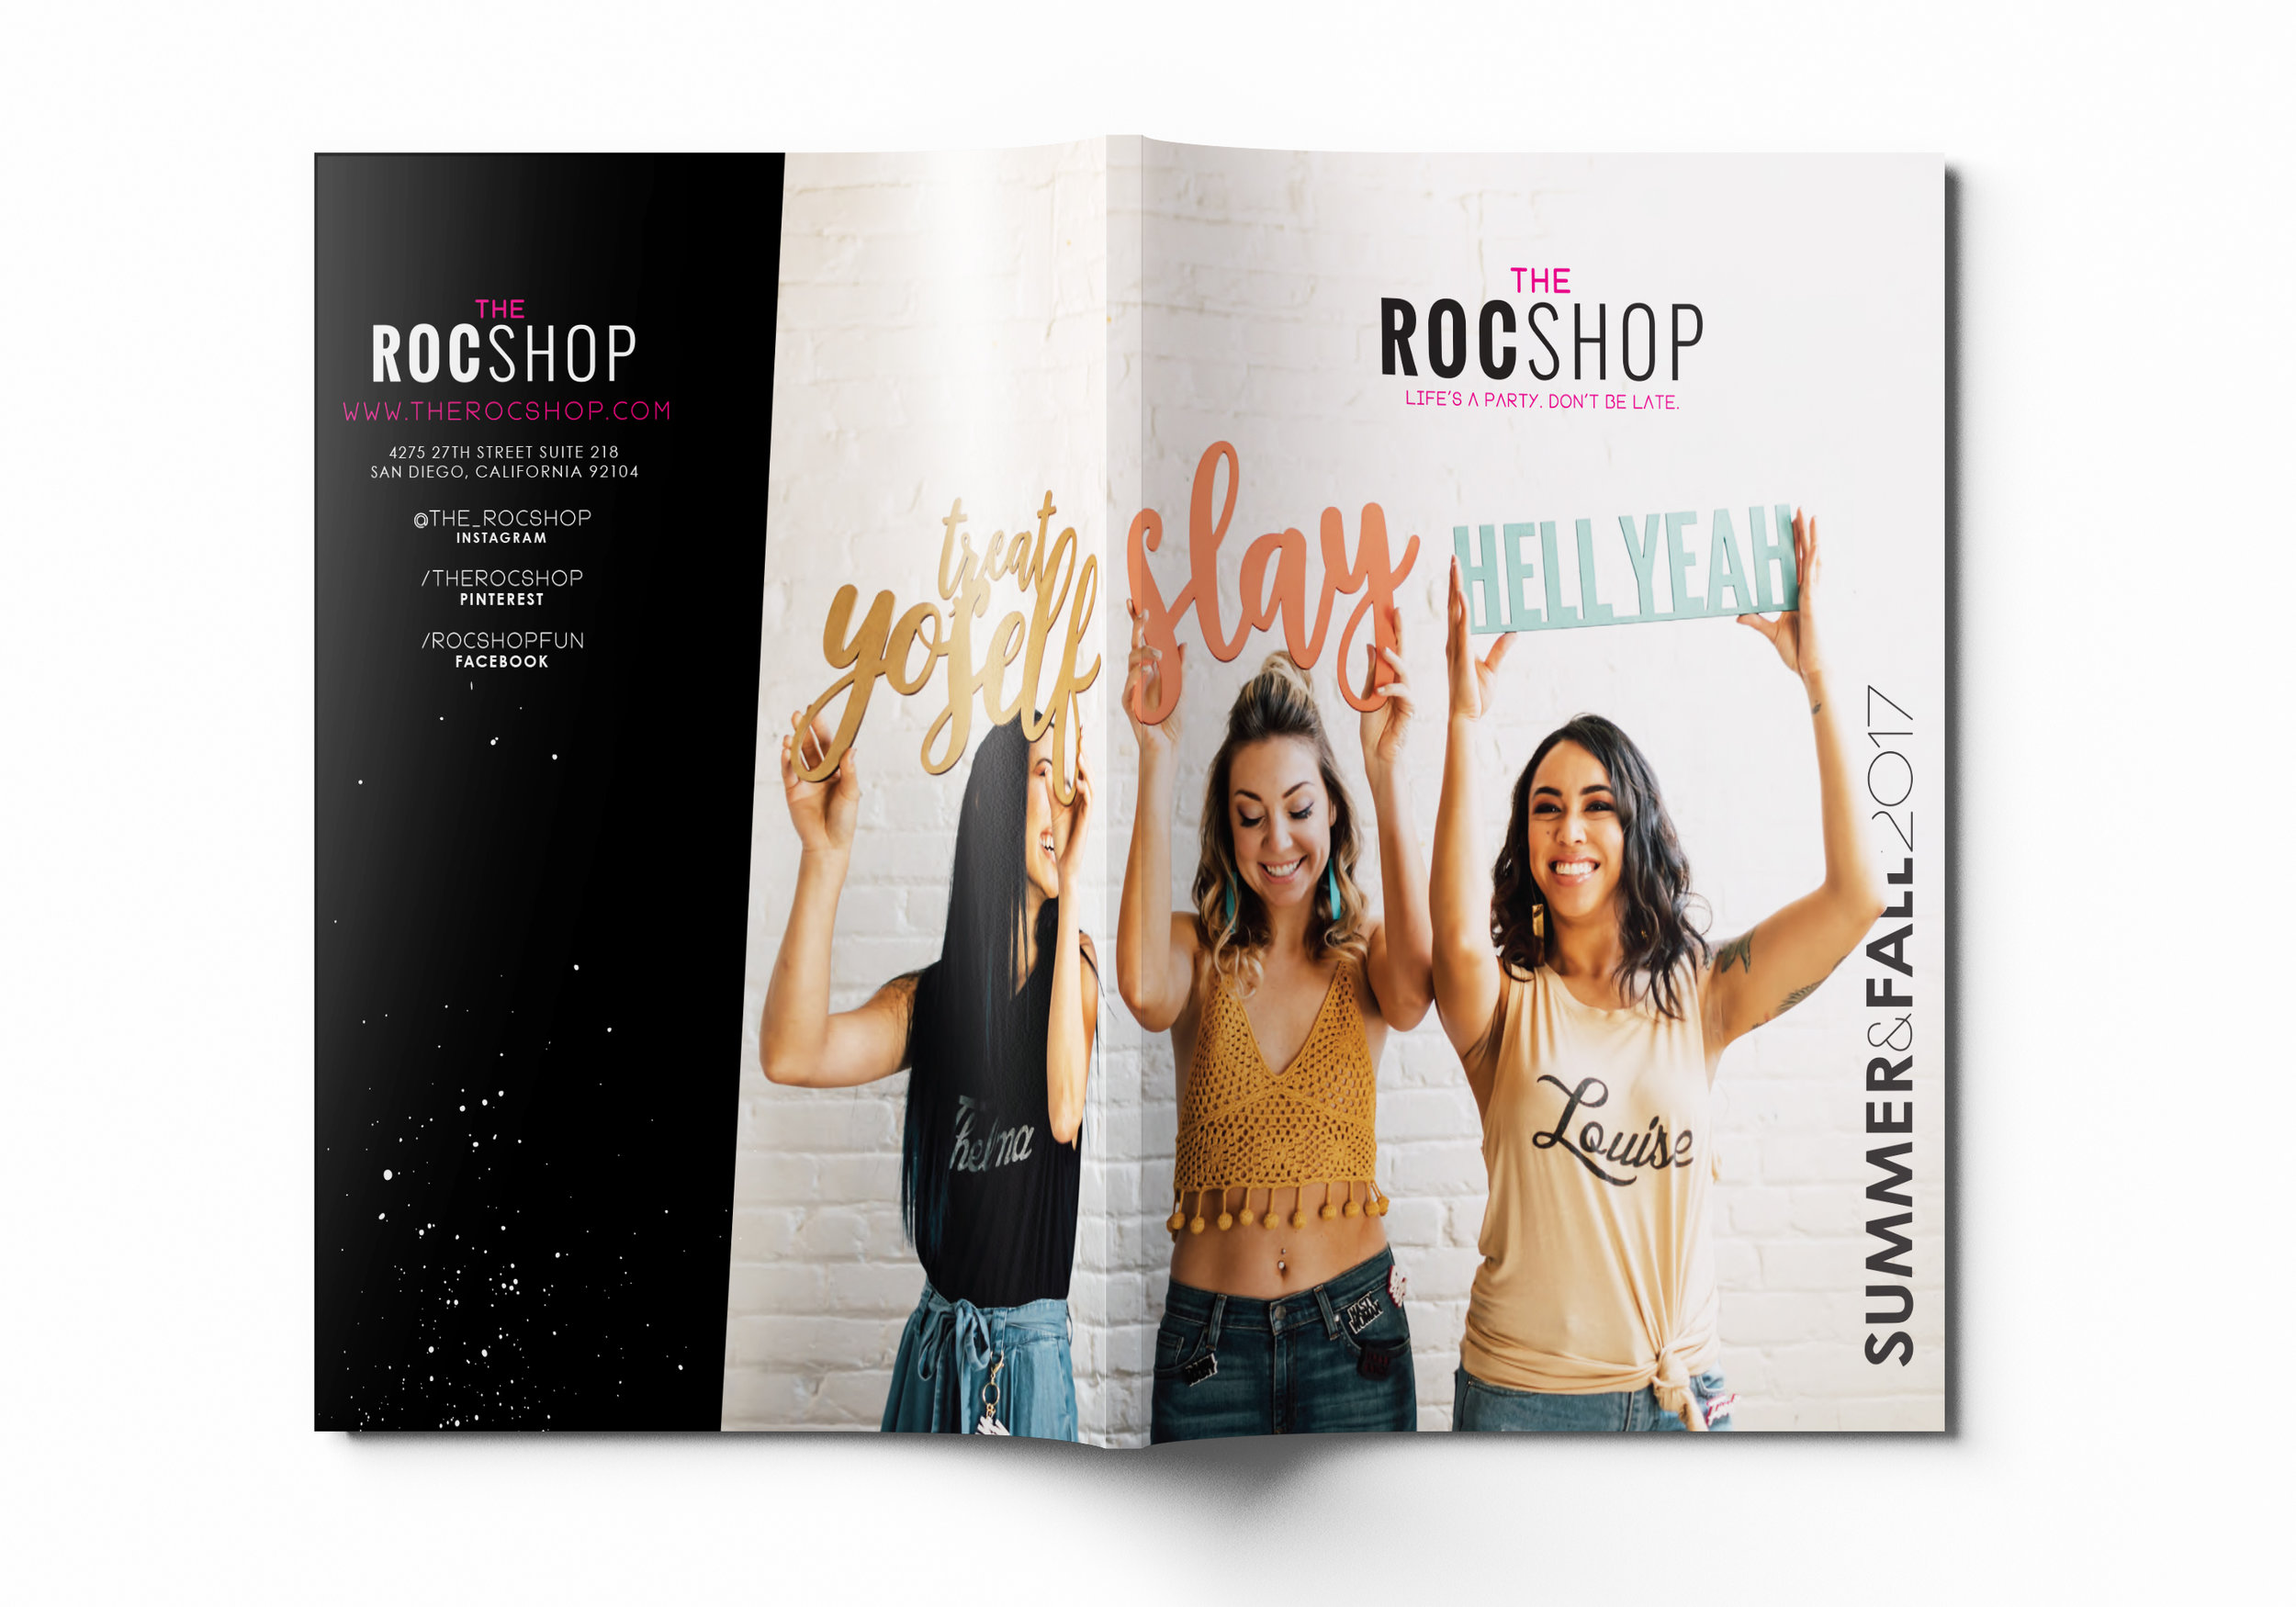 rocshop-cover.jpg